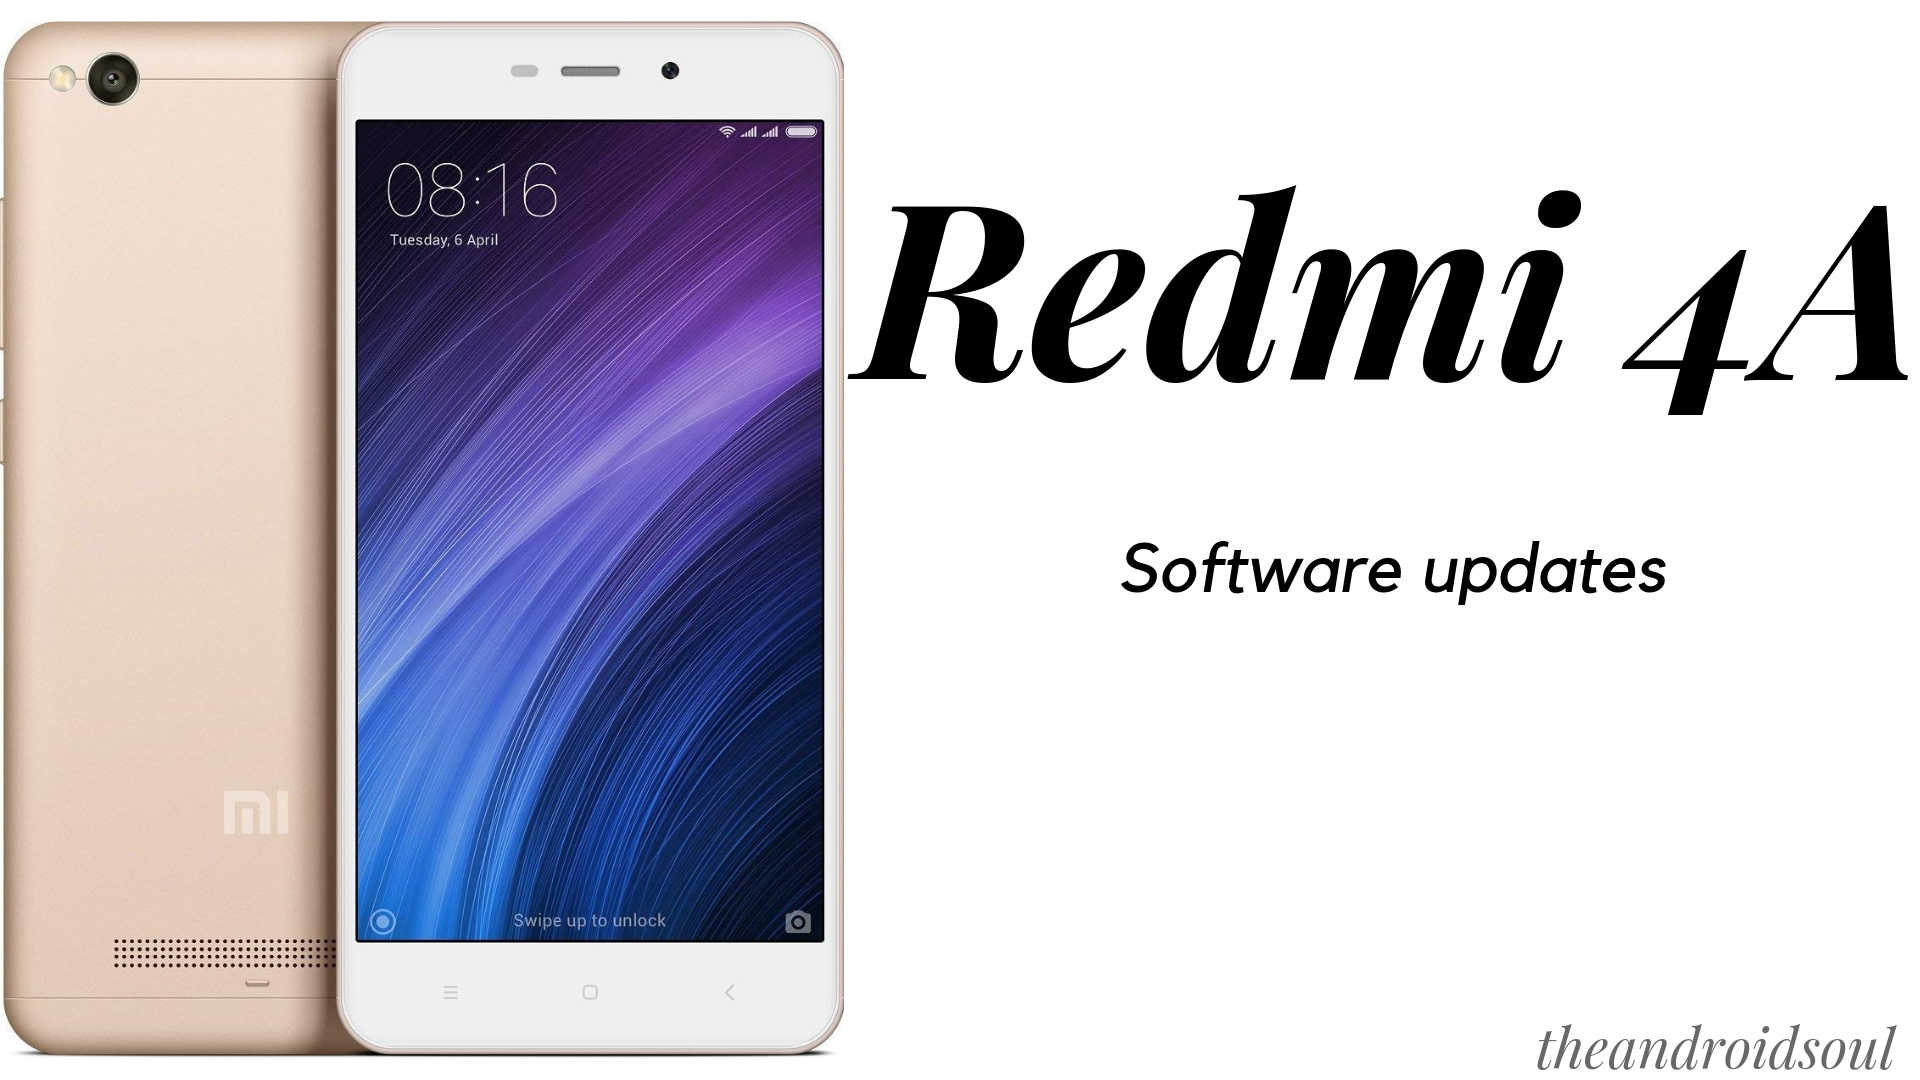 Redmi 4A software updates